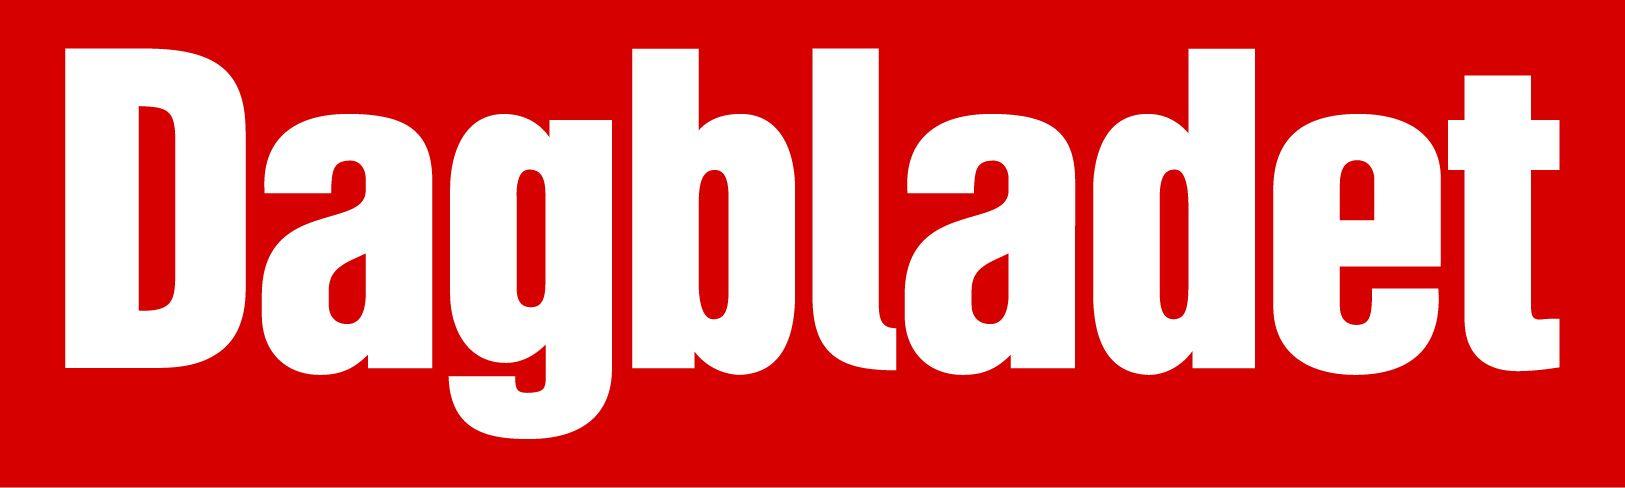 dagbladet-logo-rgb.jpg